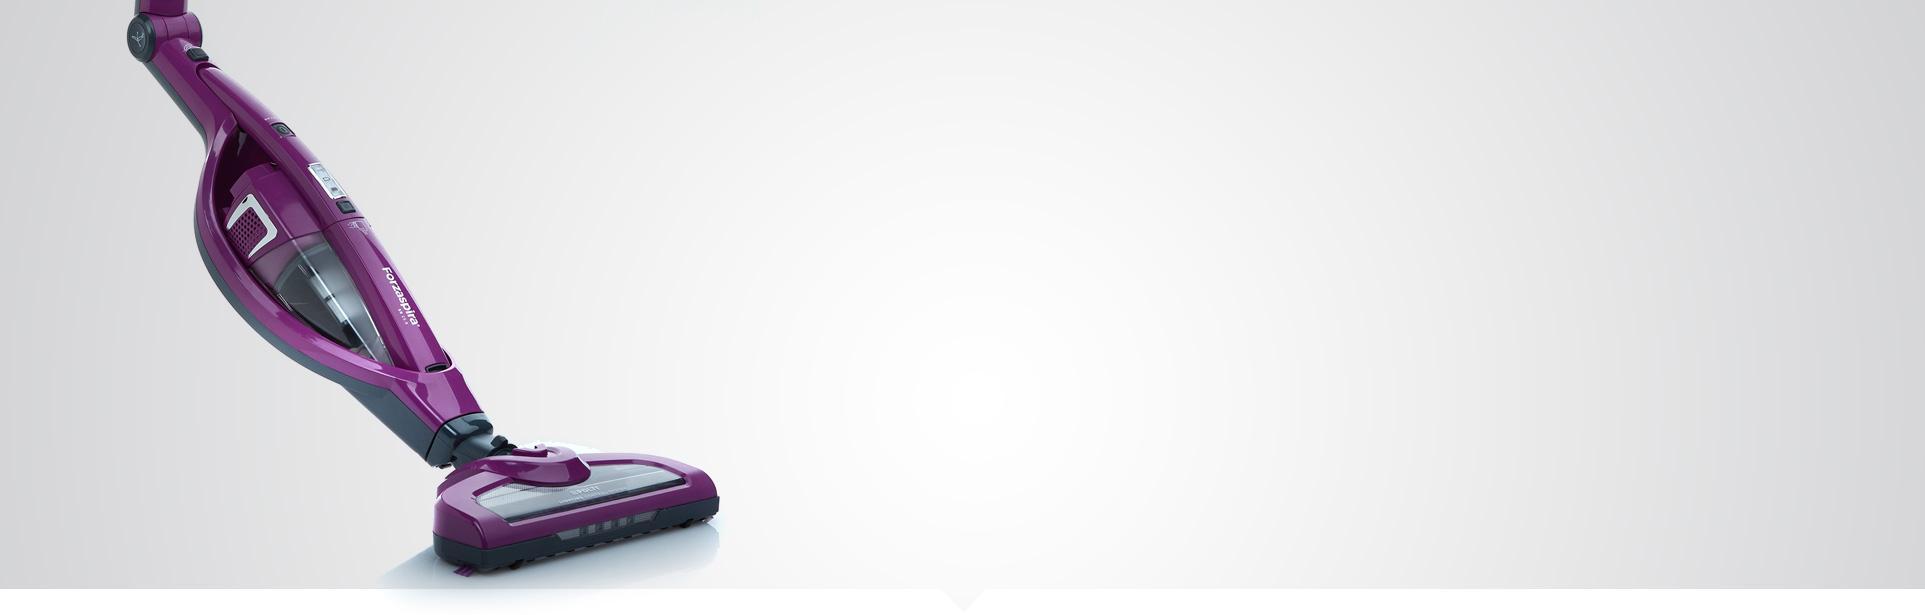 Forzaspira: cordless stick vacuum cleaner